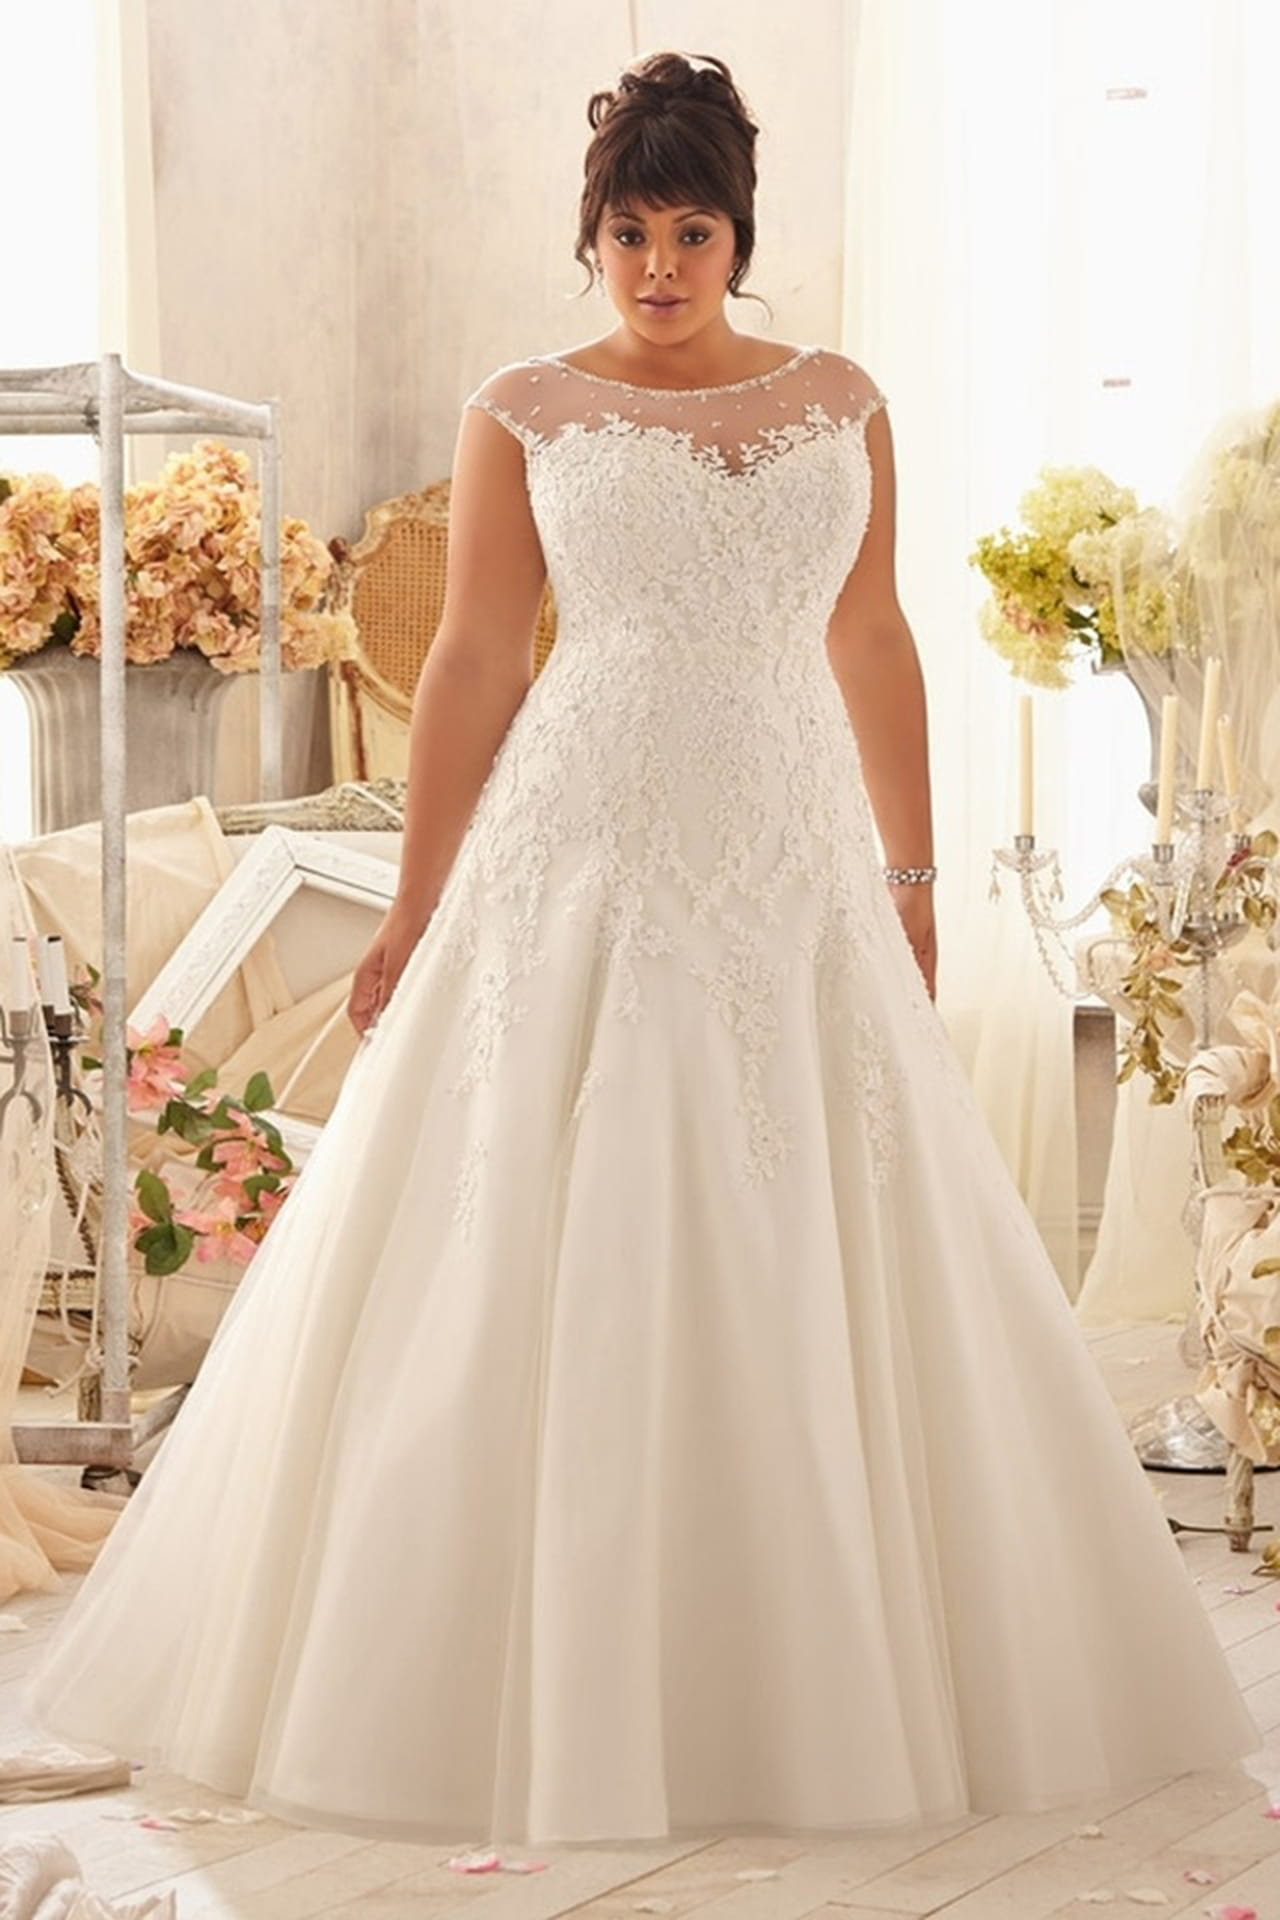 bff07cc0094a Modelo de vestido de noiva plus size da estilista Madeline Gardner.